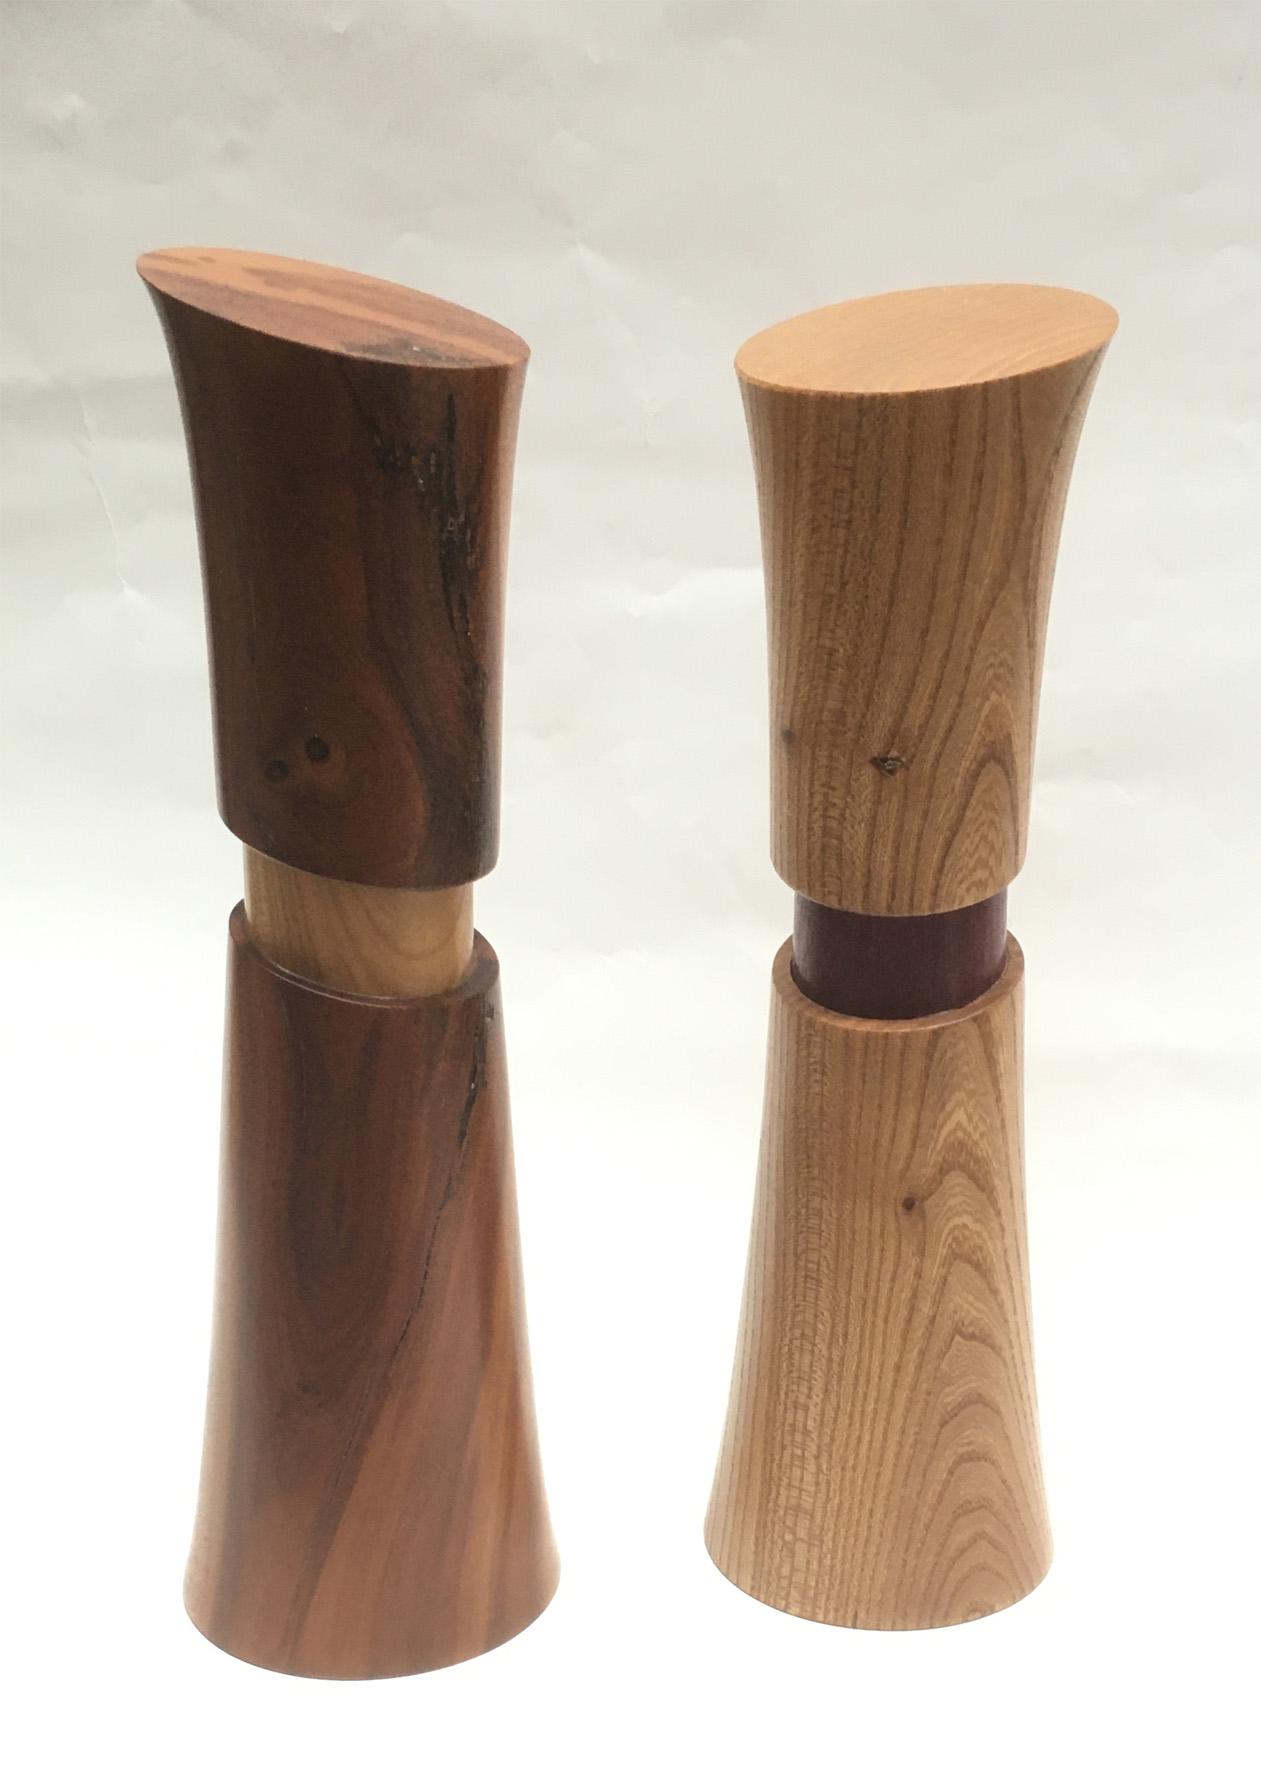 Bernd Pfister . Woodturned Objects